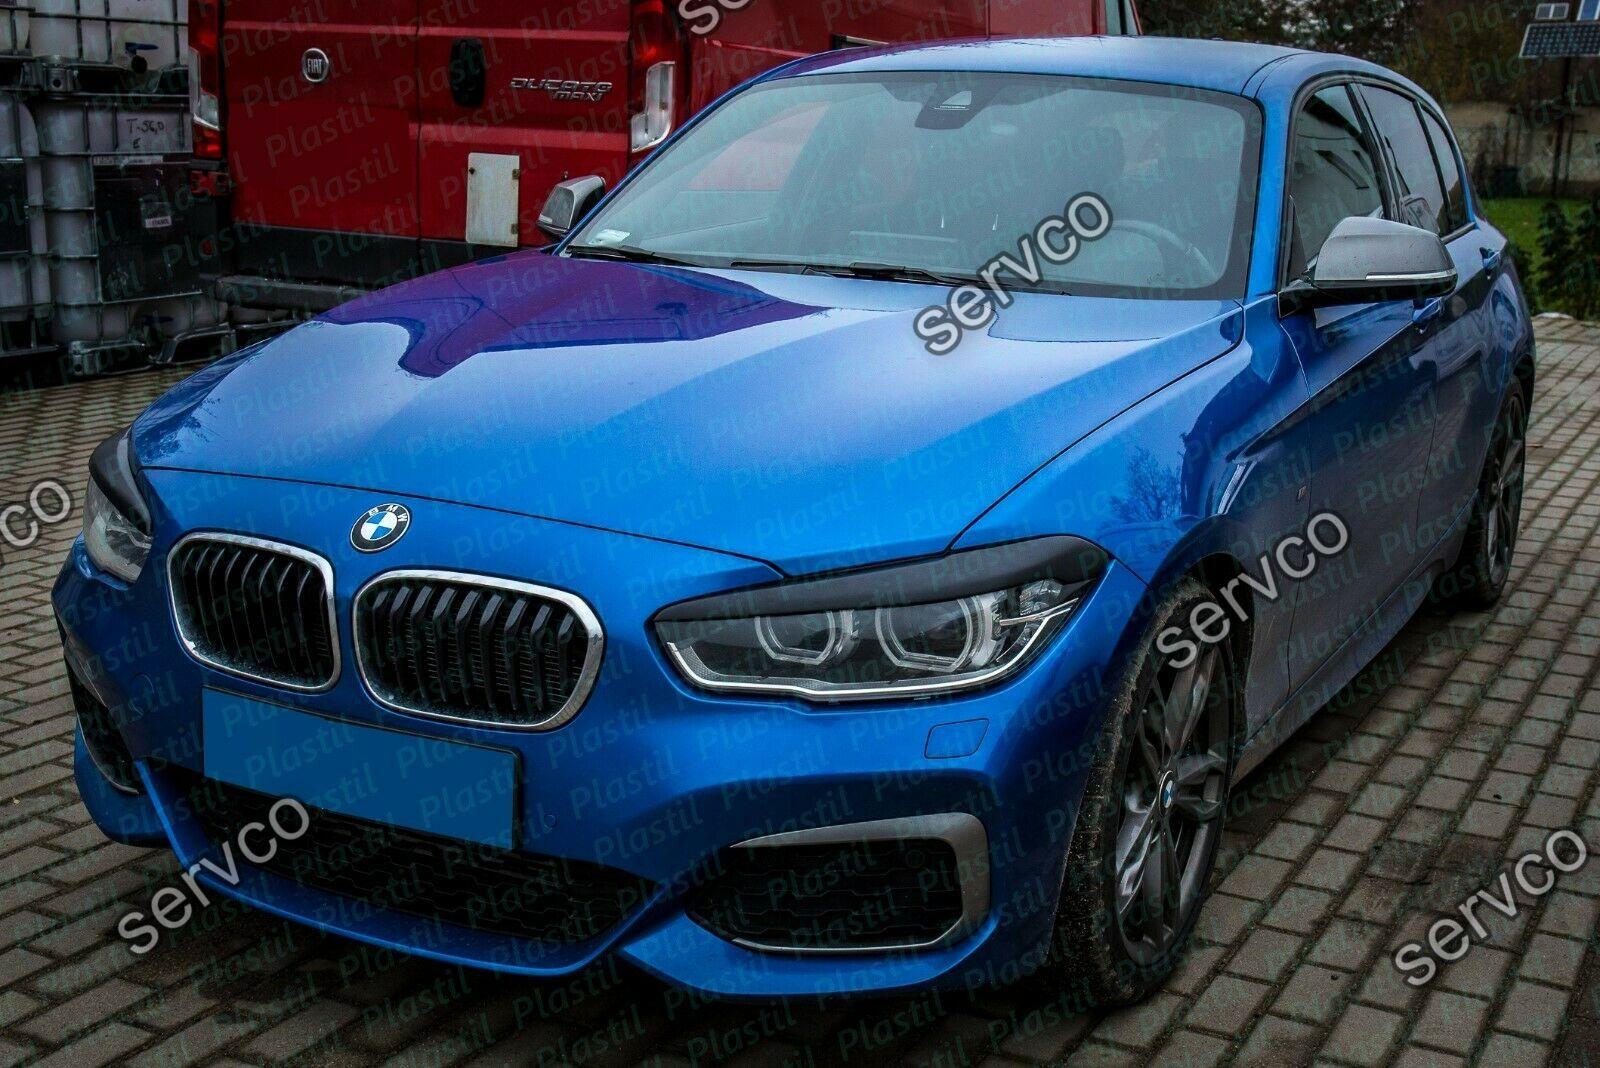 Set pleoape faruri BMW Seria 1 F20 Facelift 2015-2019 v1